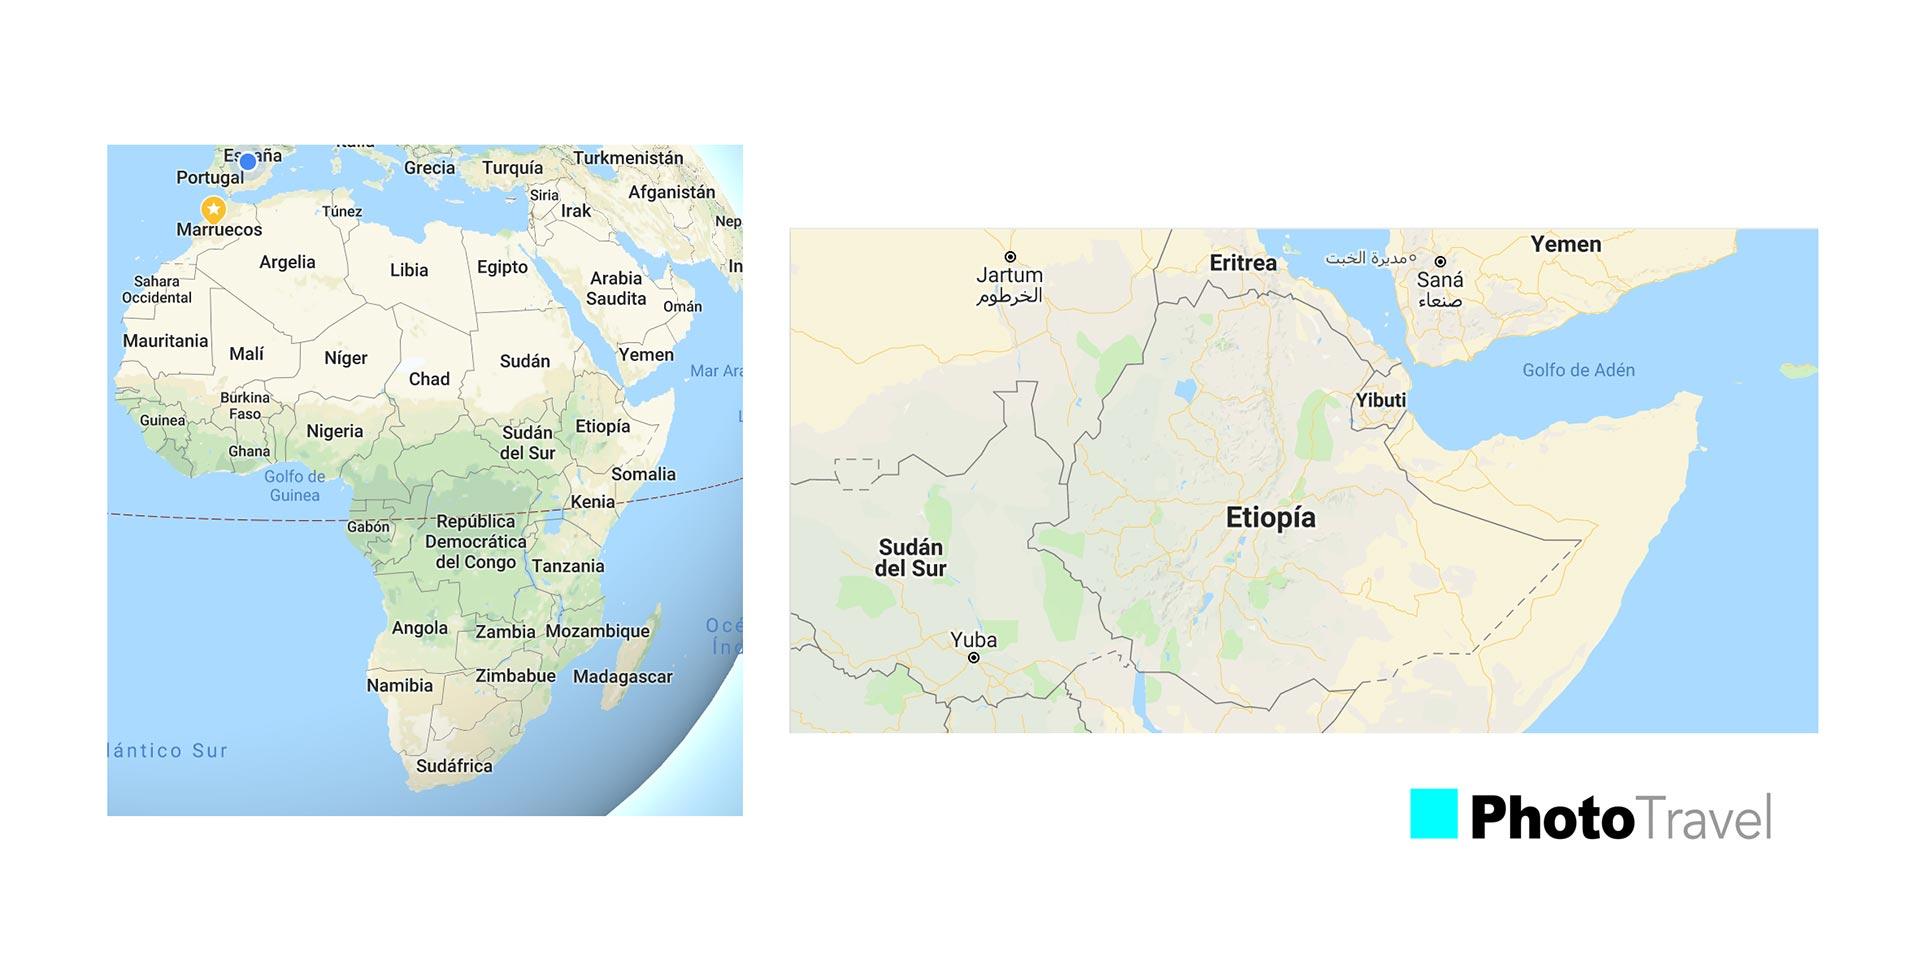 viaje-fotografico-etiopia-phototravel